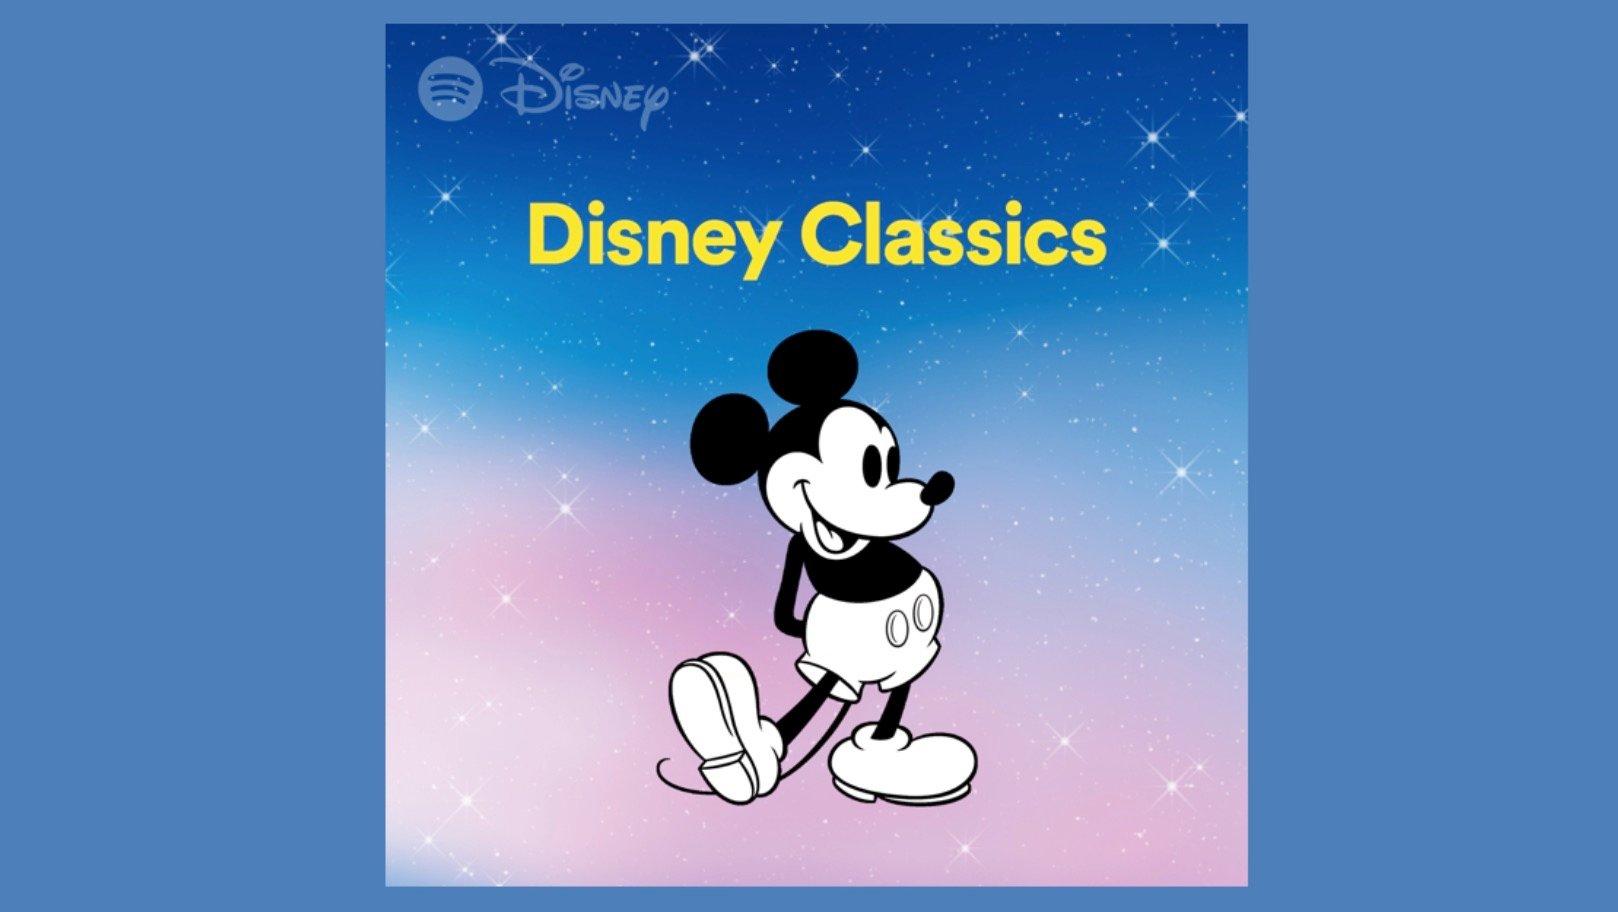 spotify disney hub 758x427 - Spotify's Disney Hub offers tunes from Star Wars, Frozen, Marvel and other popular Disney franchises